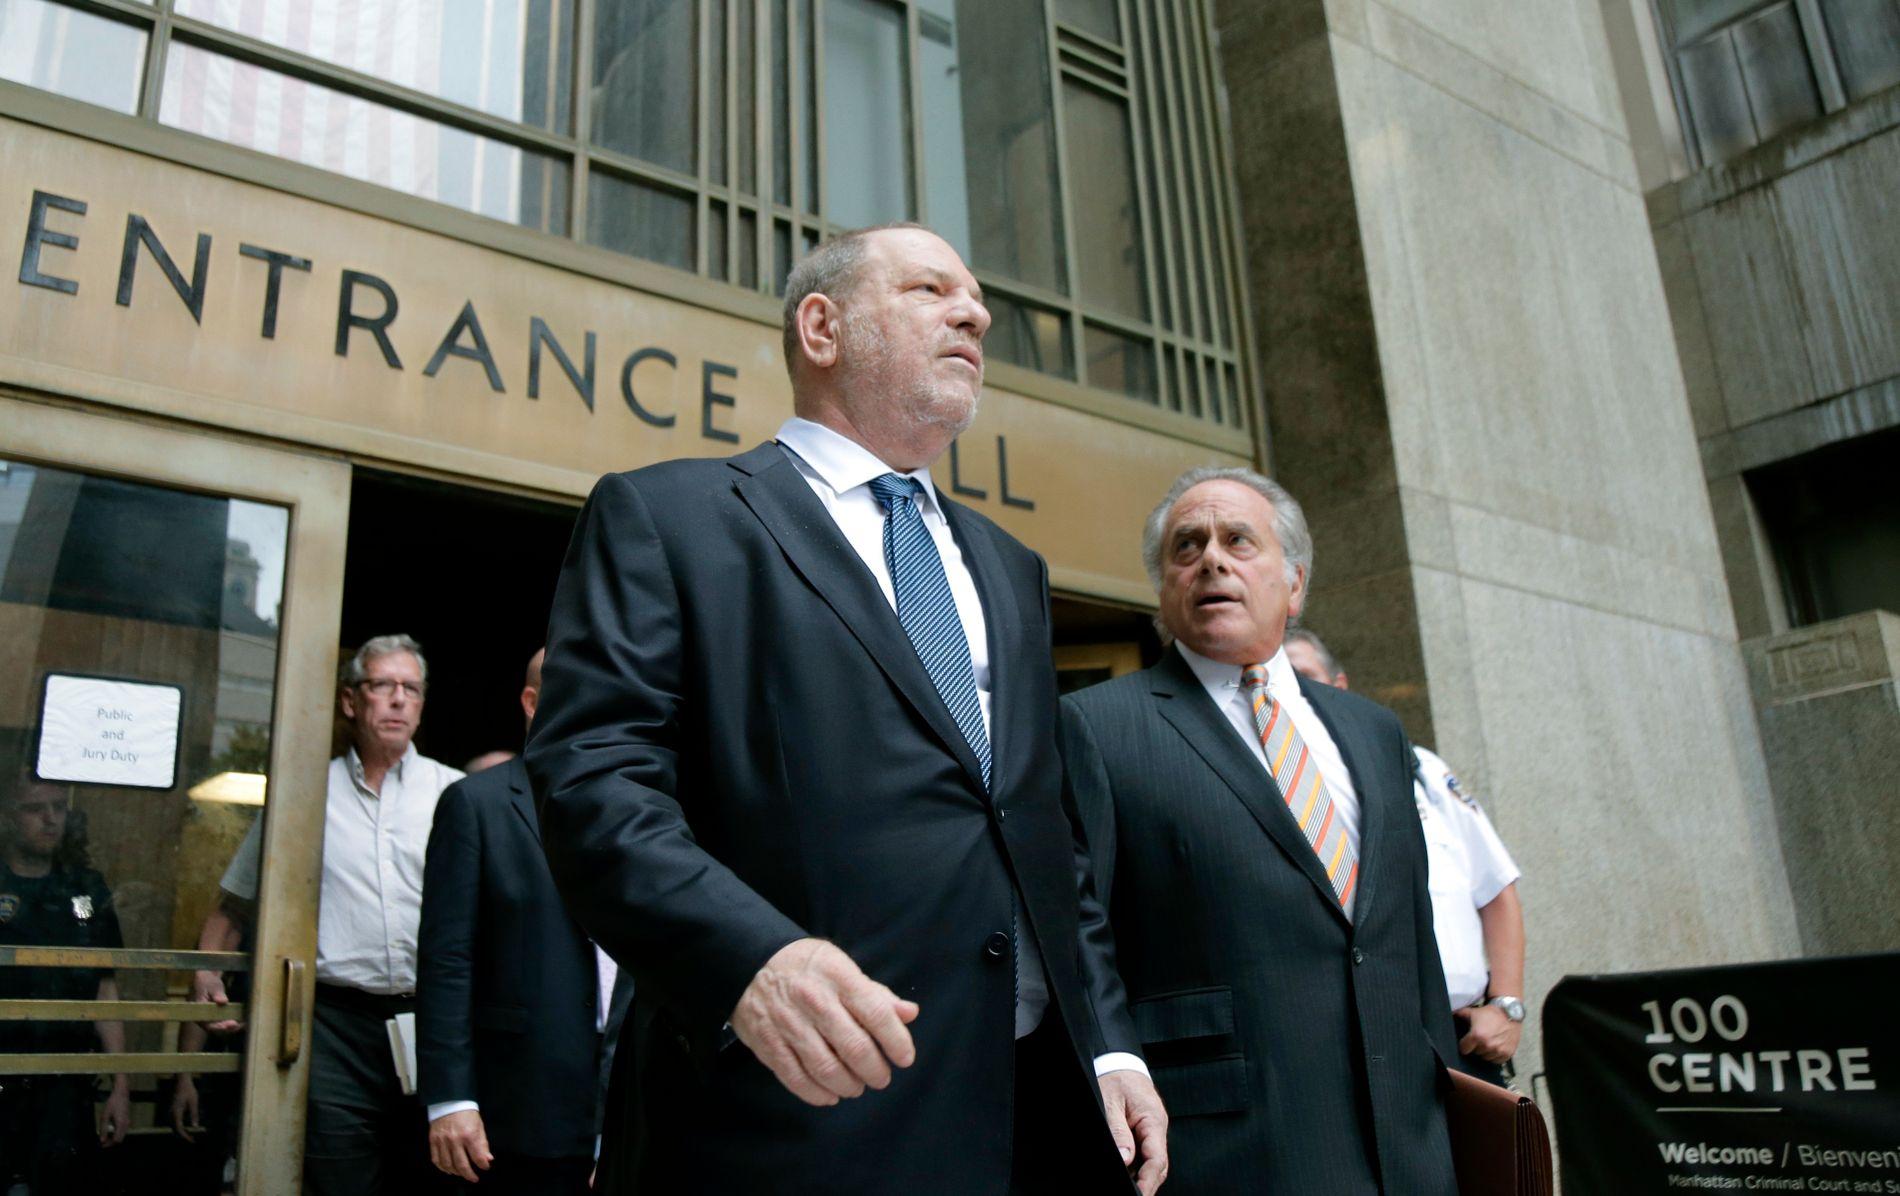 Harvey Weinstein forlater rettssalen i New York sammen med sin forsvarer Benjamin Brafman torsdag. Foto: Seth Wenig / AP / NTB scanpix